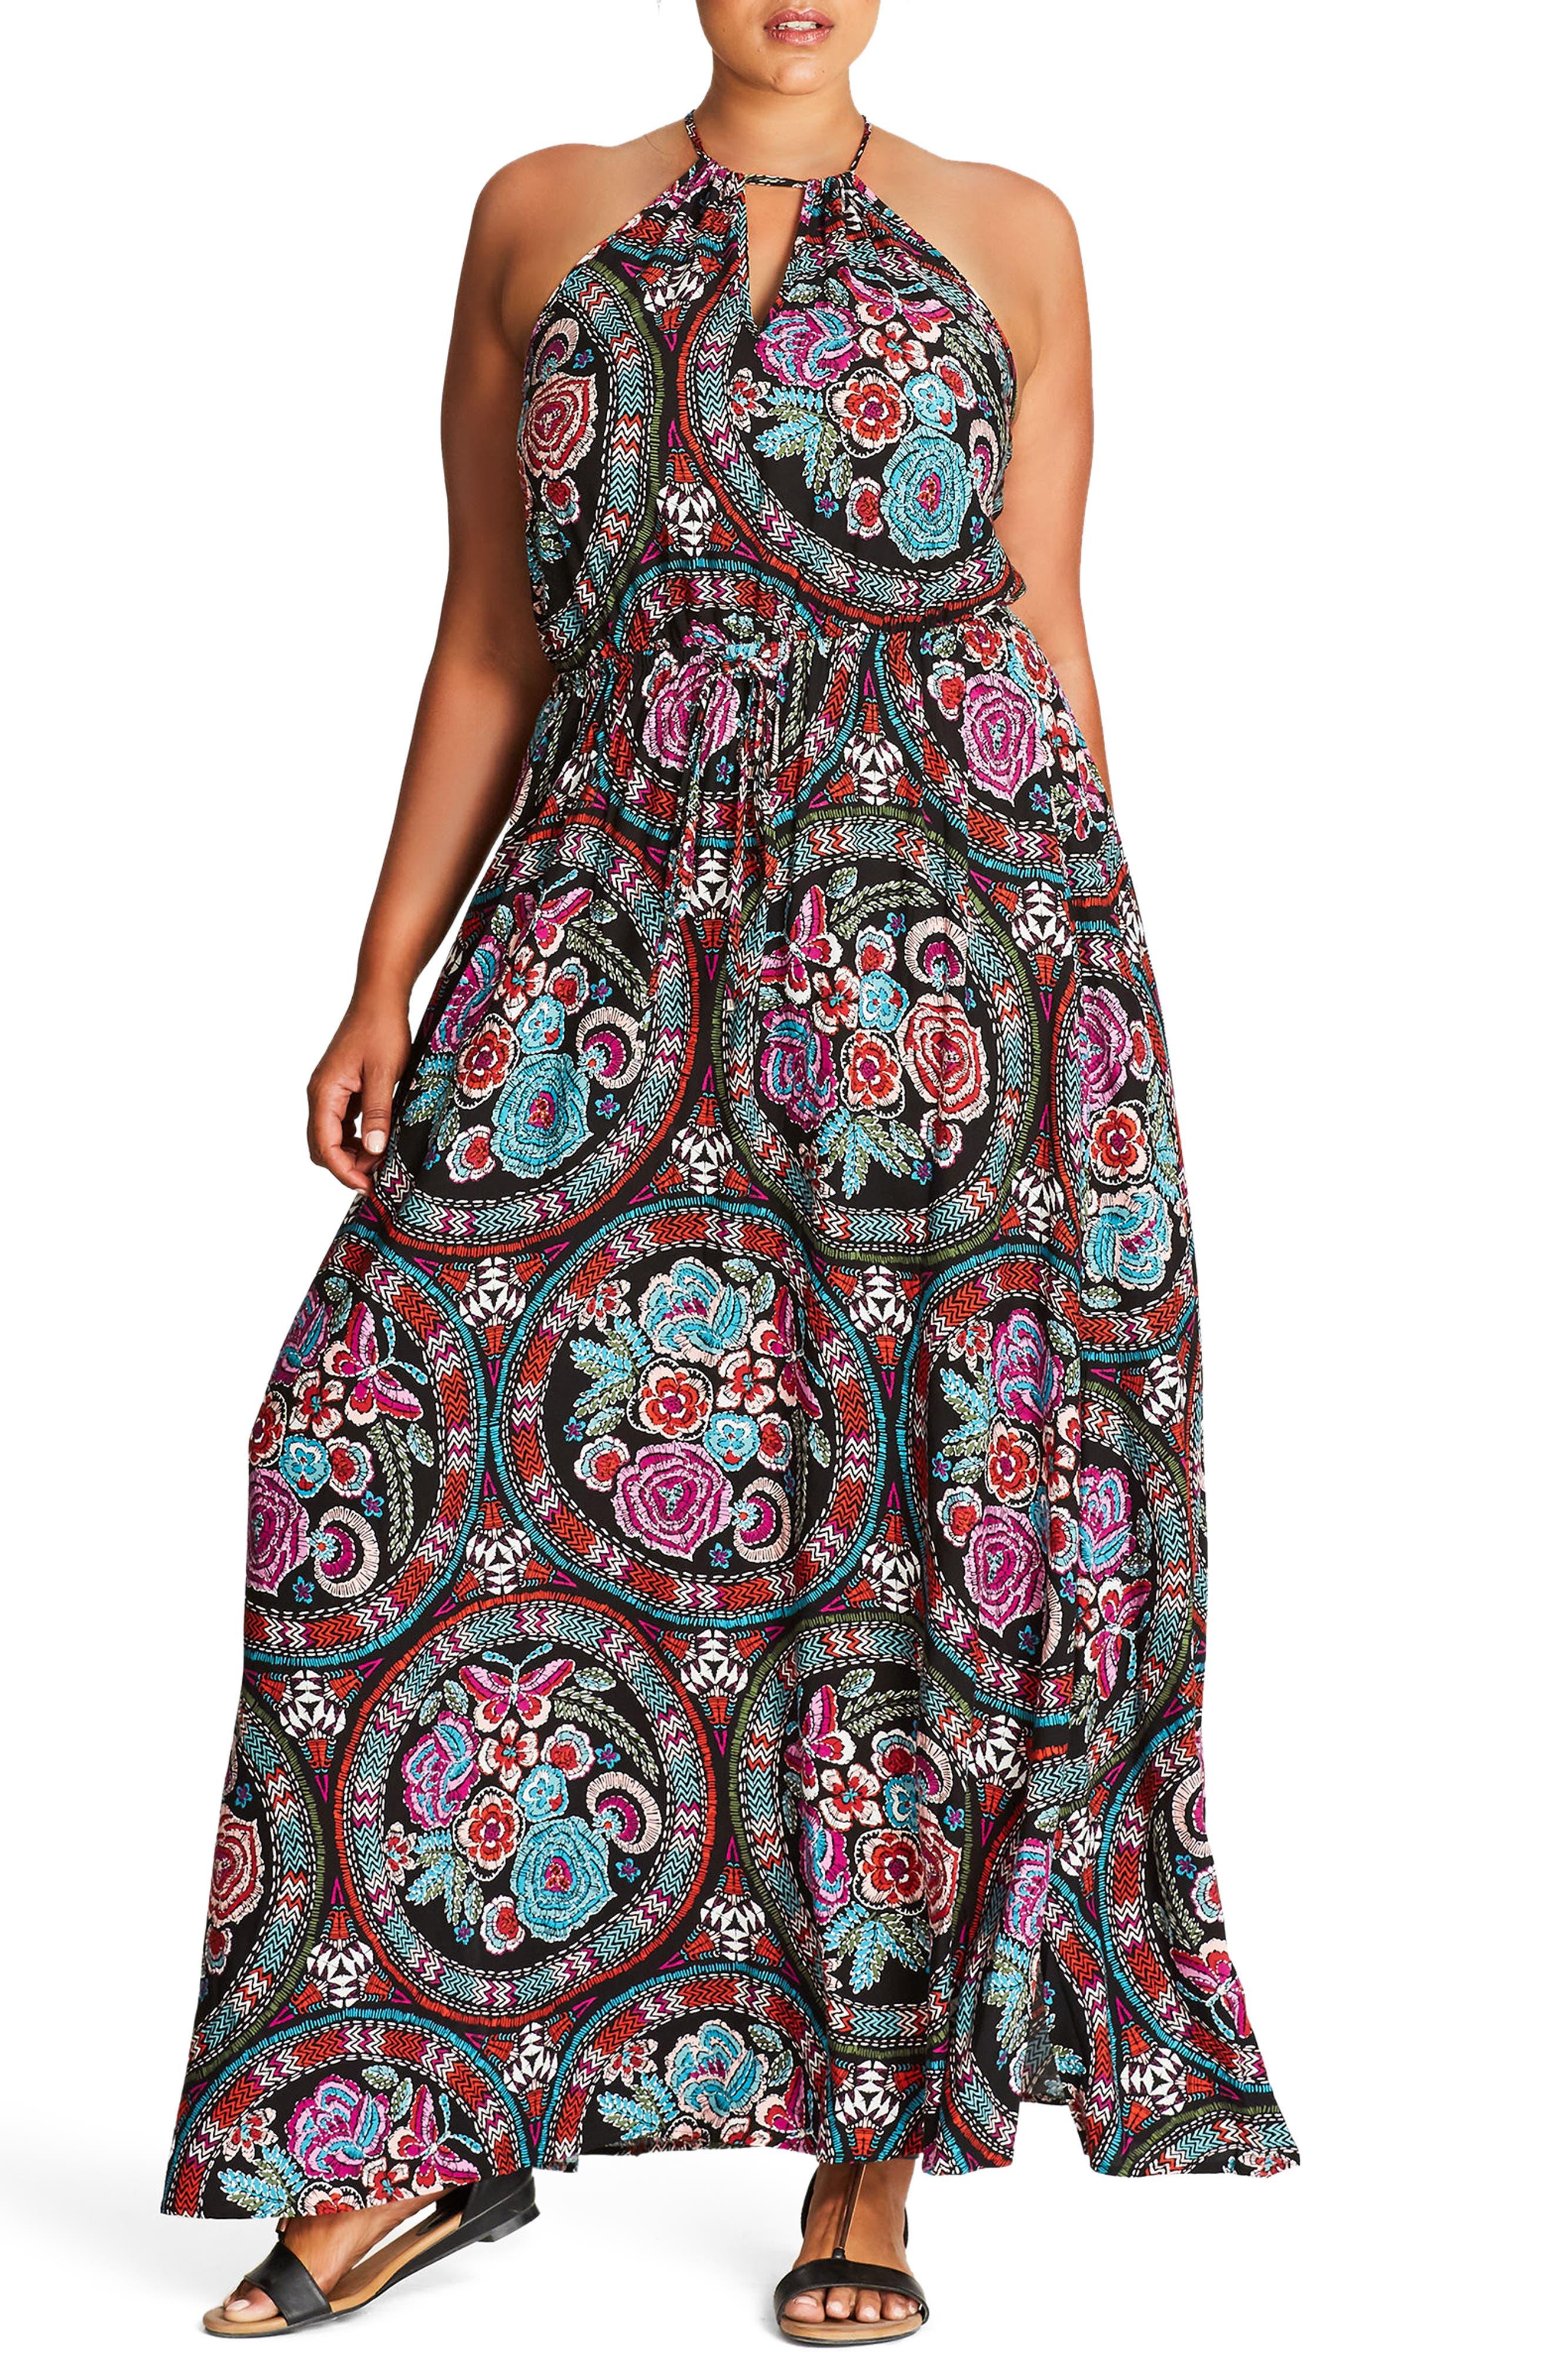 60s 70s Plus Size Dresses, Clothing, Costumes Plus Size Womens City Chic Folklore Maxi Dress $89.00 AT vintagedancer.com